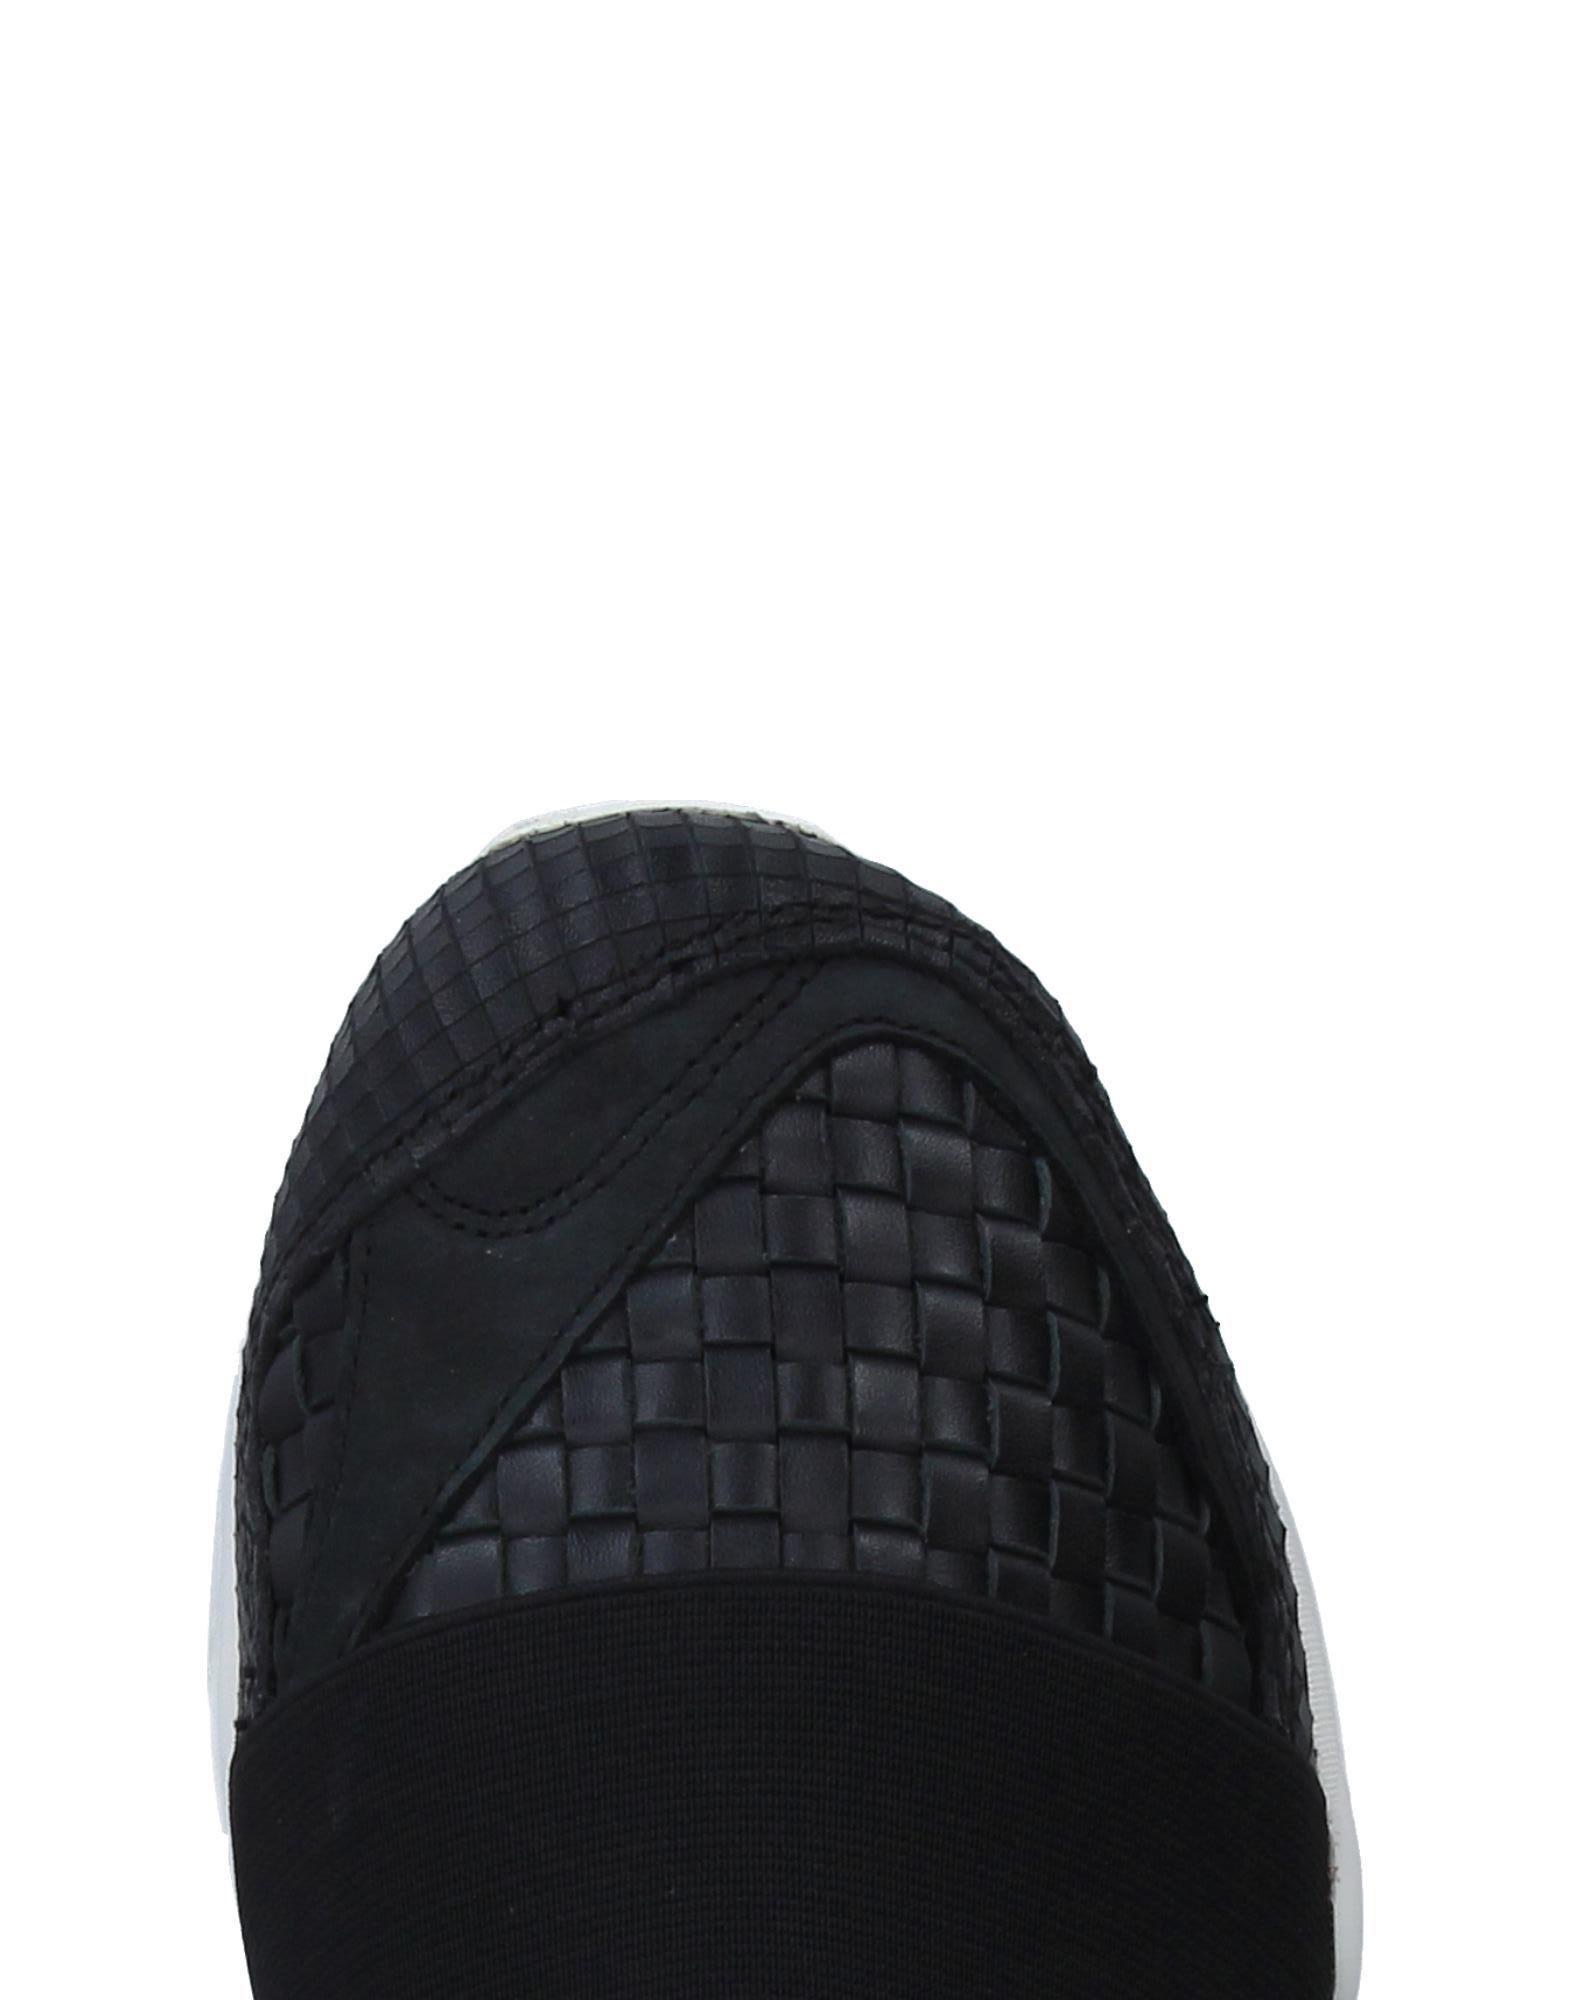 Puma Gute Sneakers Herren  11327153PM Gute Puma Qualität beliebte Schuhe 438db3